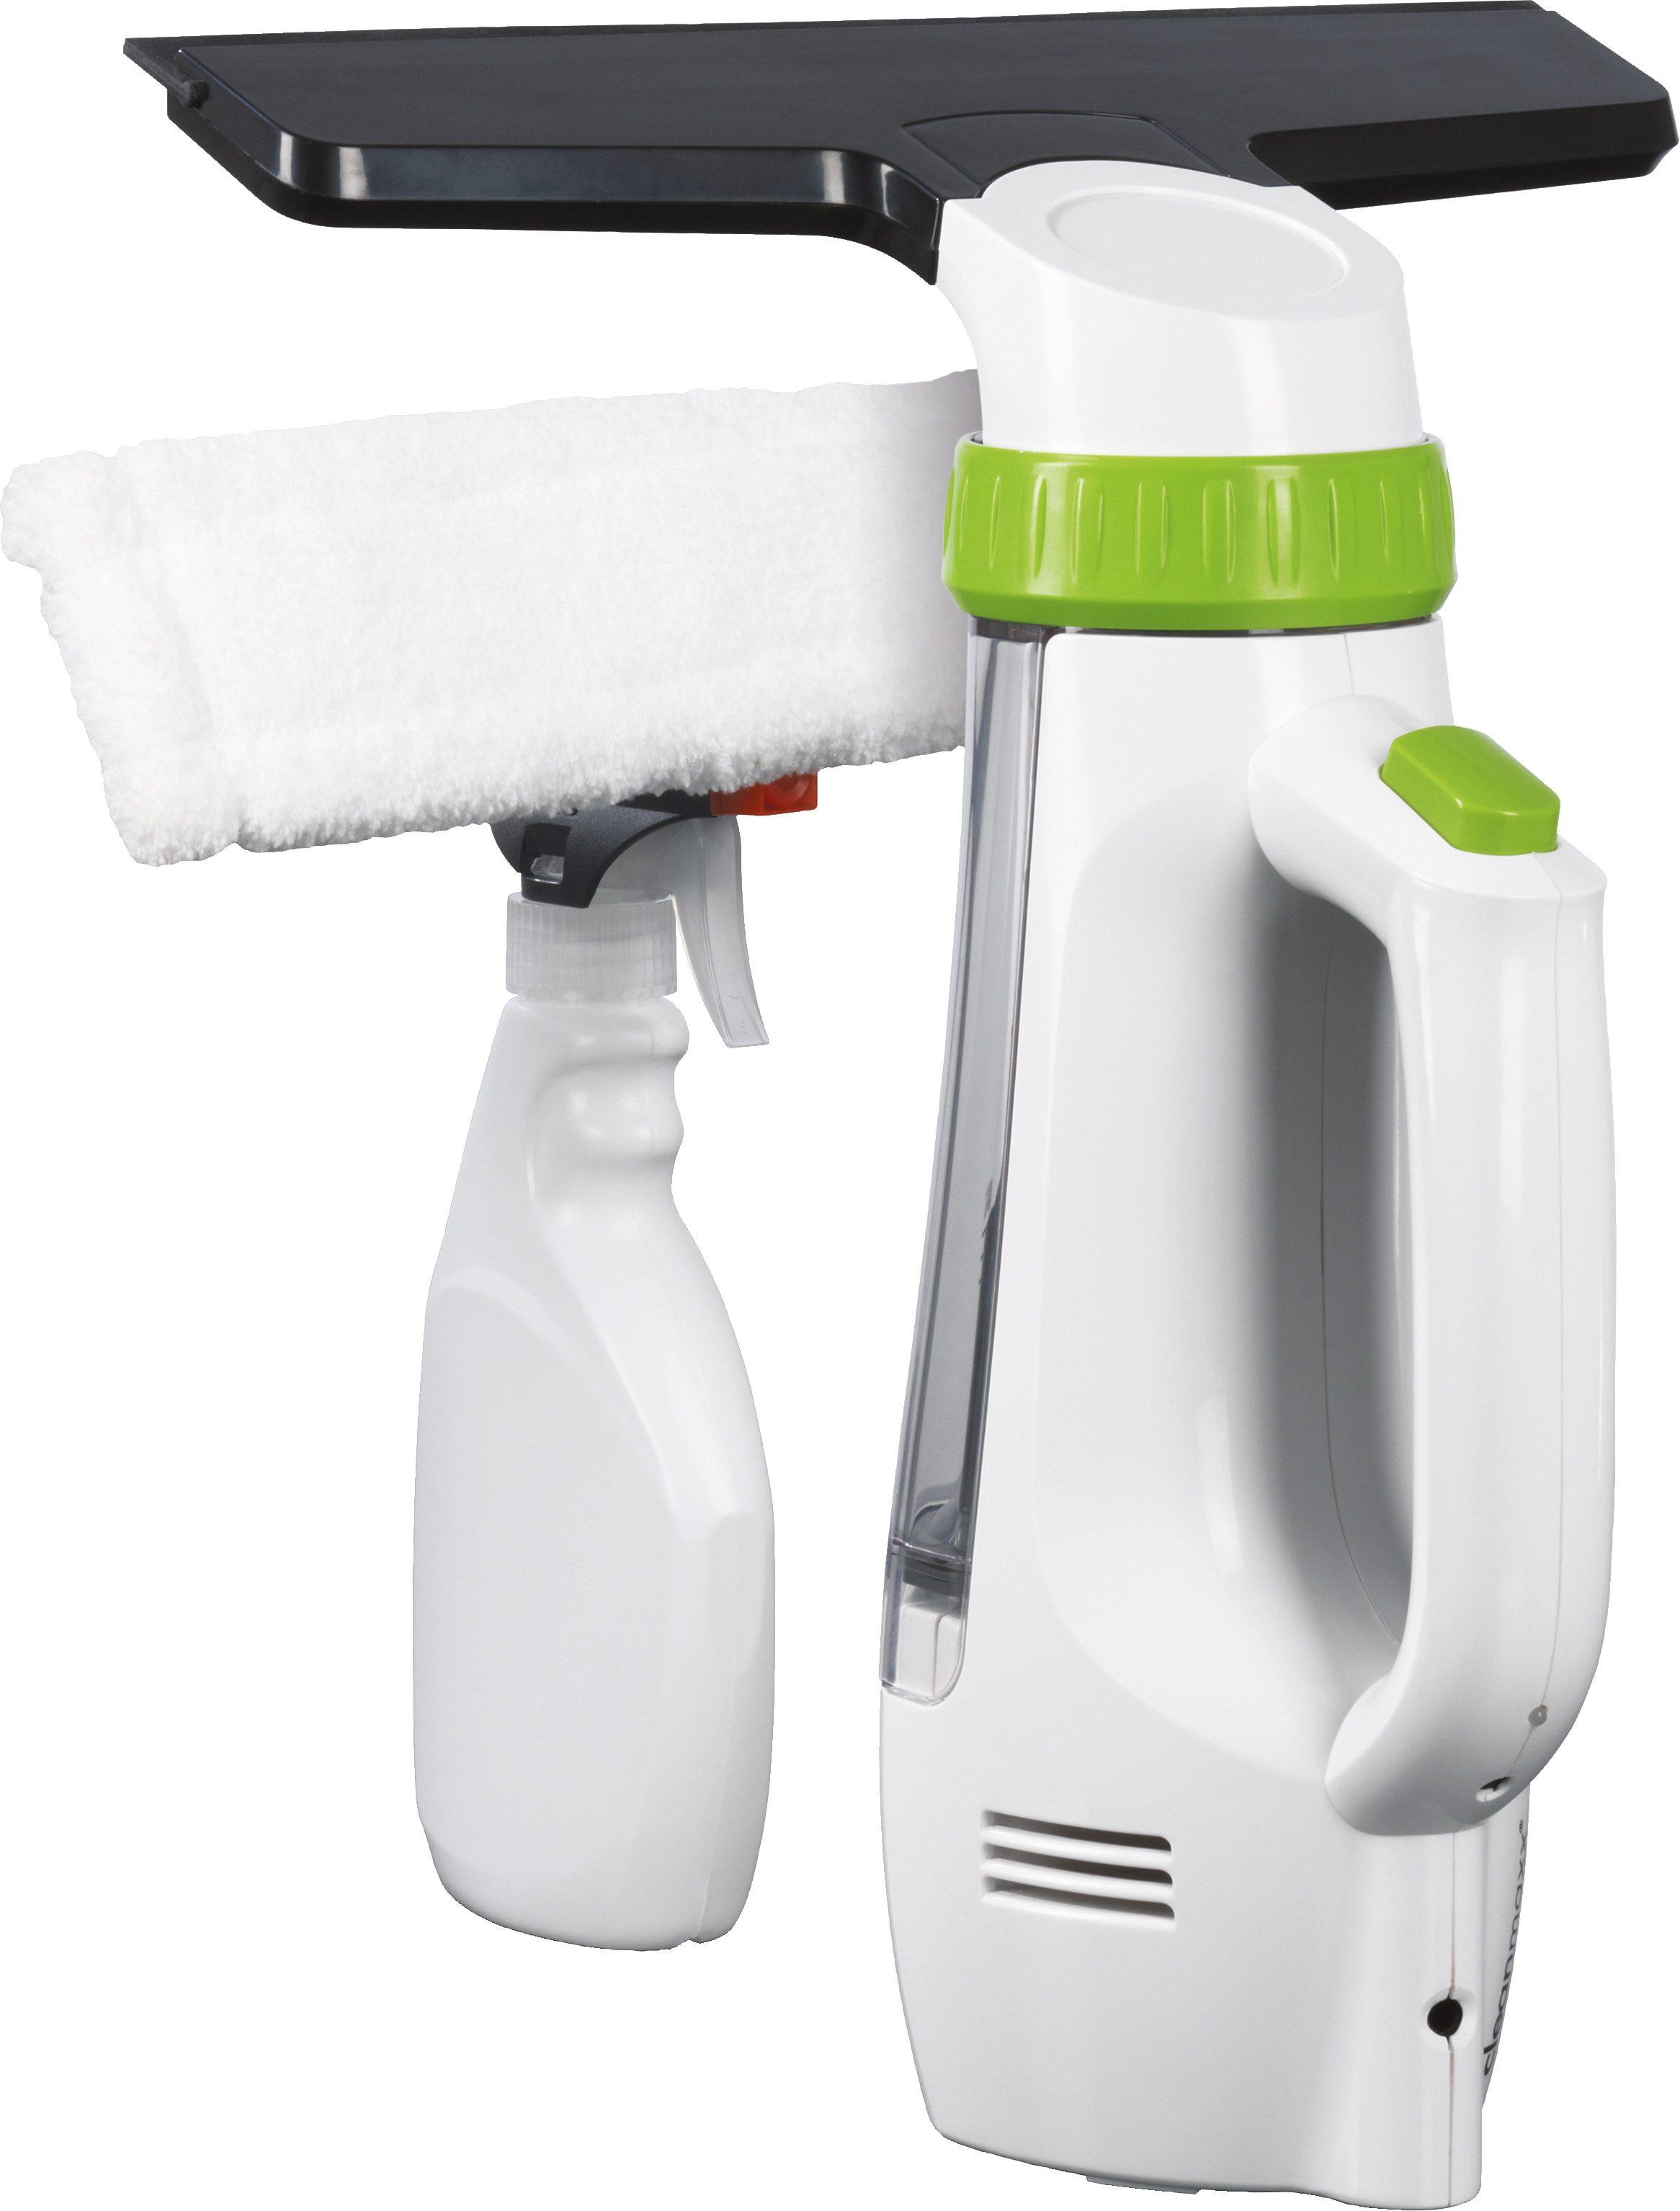 Clean Maxx Akku-Fensterreiniger Professional weiß-limegreen